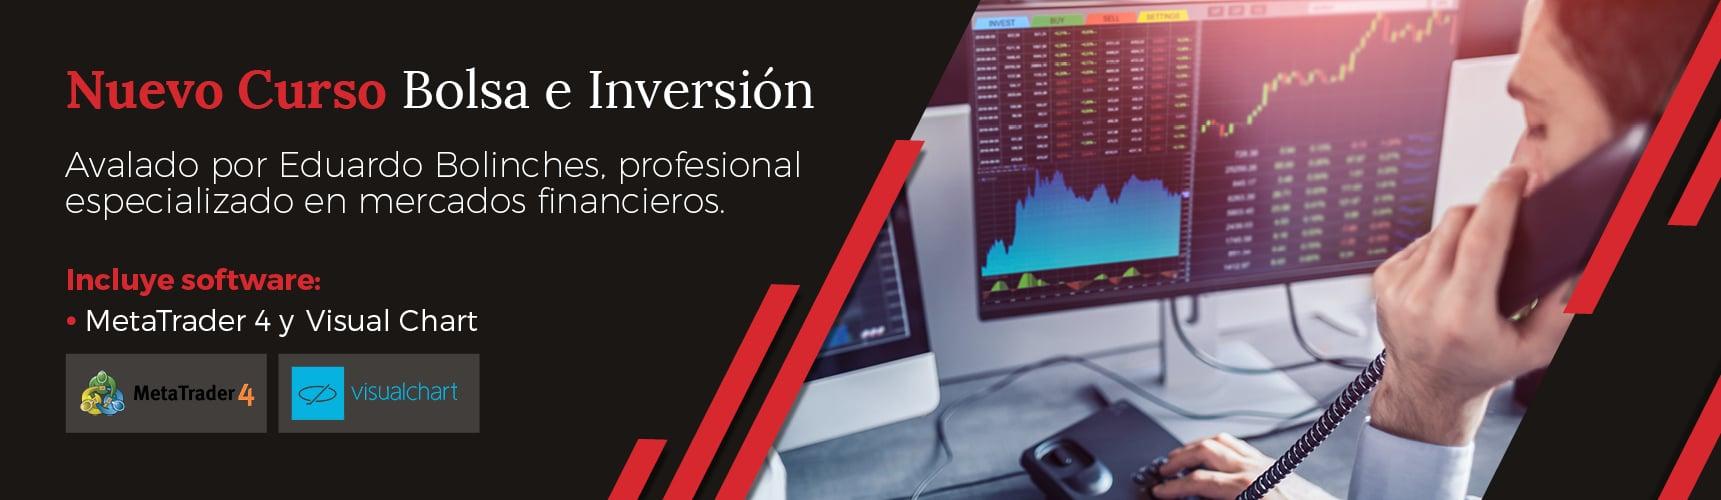 Nuevo Curso de Bolsa e Inversión